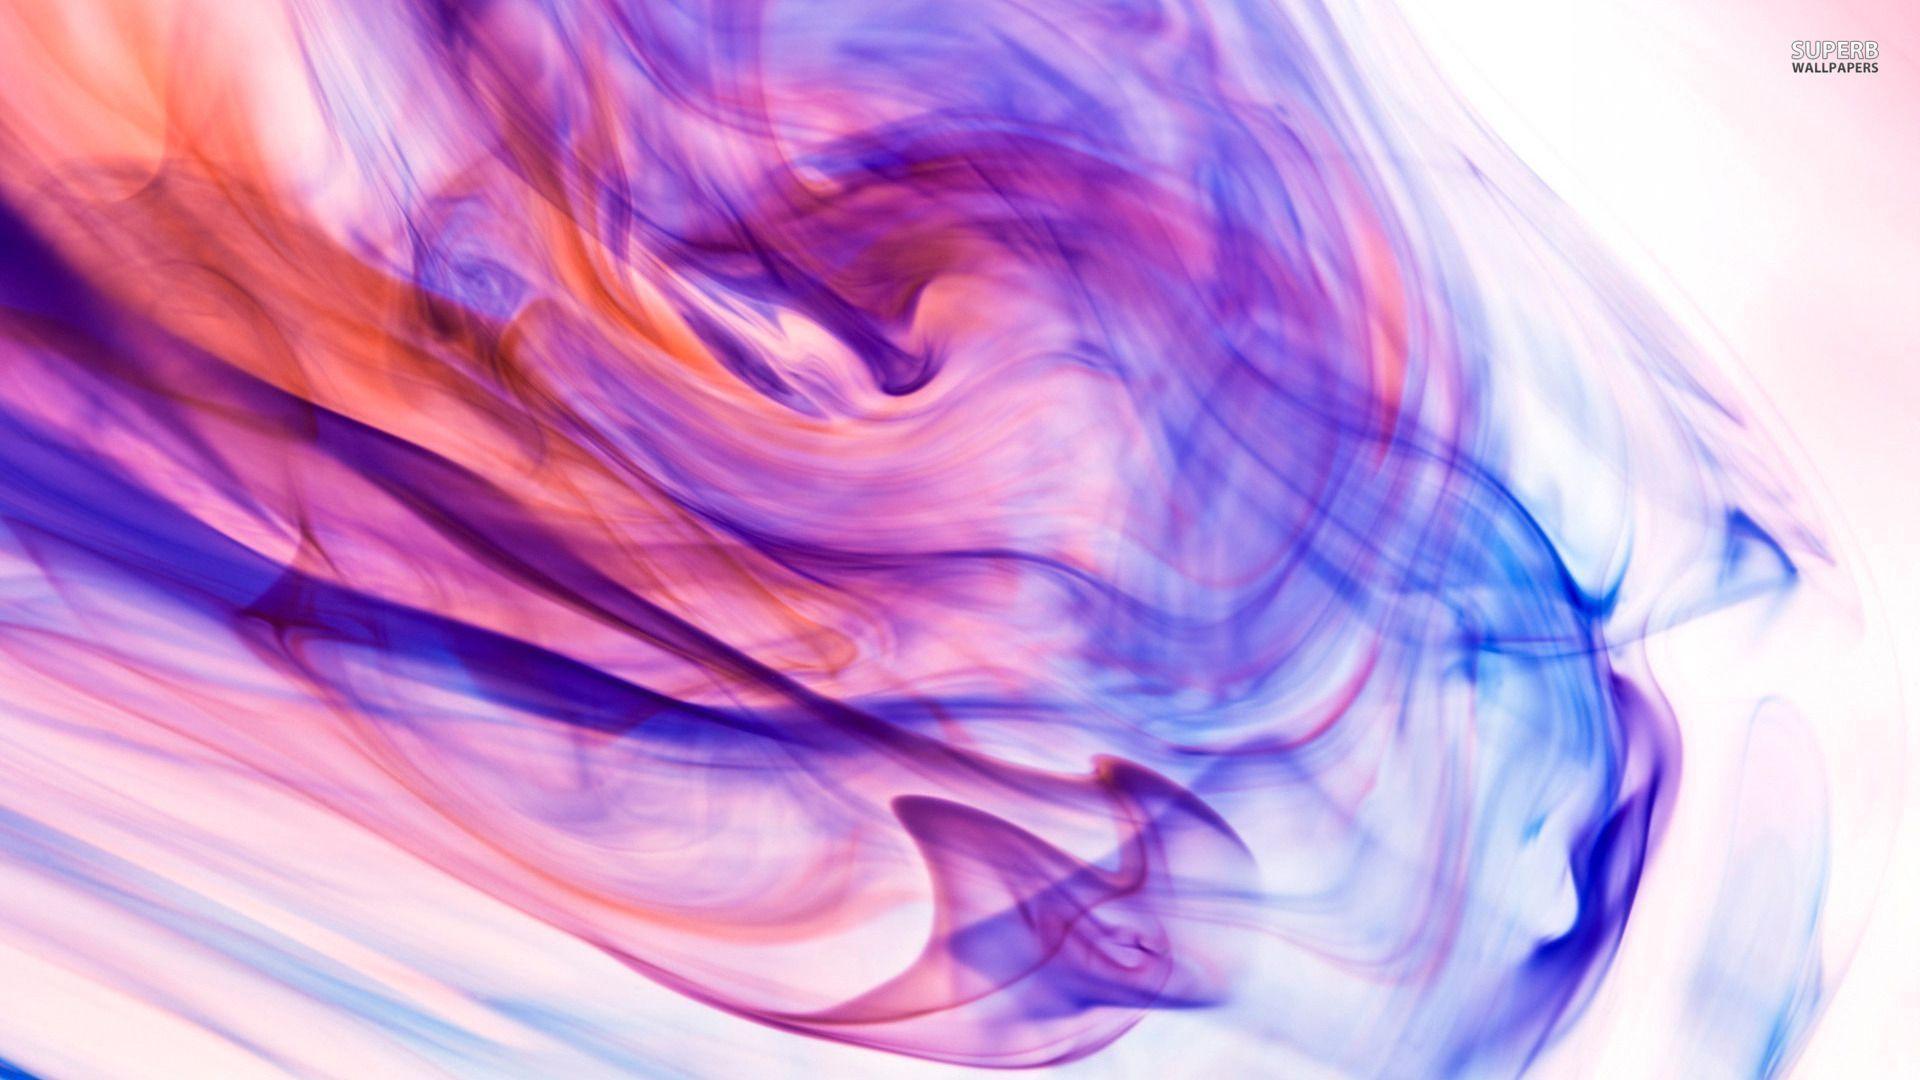 colorful smoke wallpaper designs - photo #30